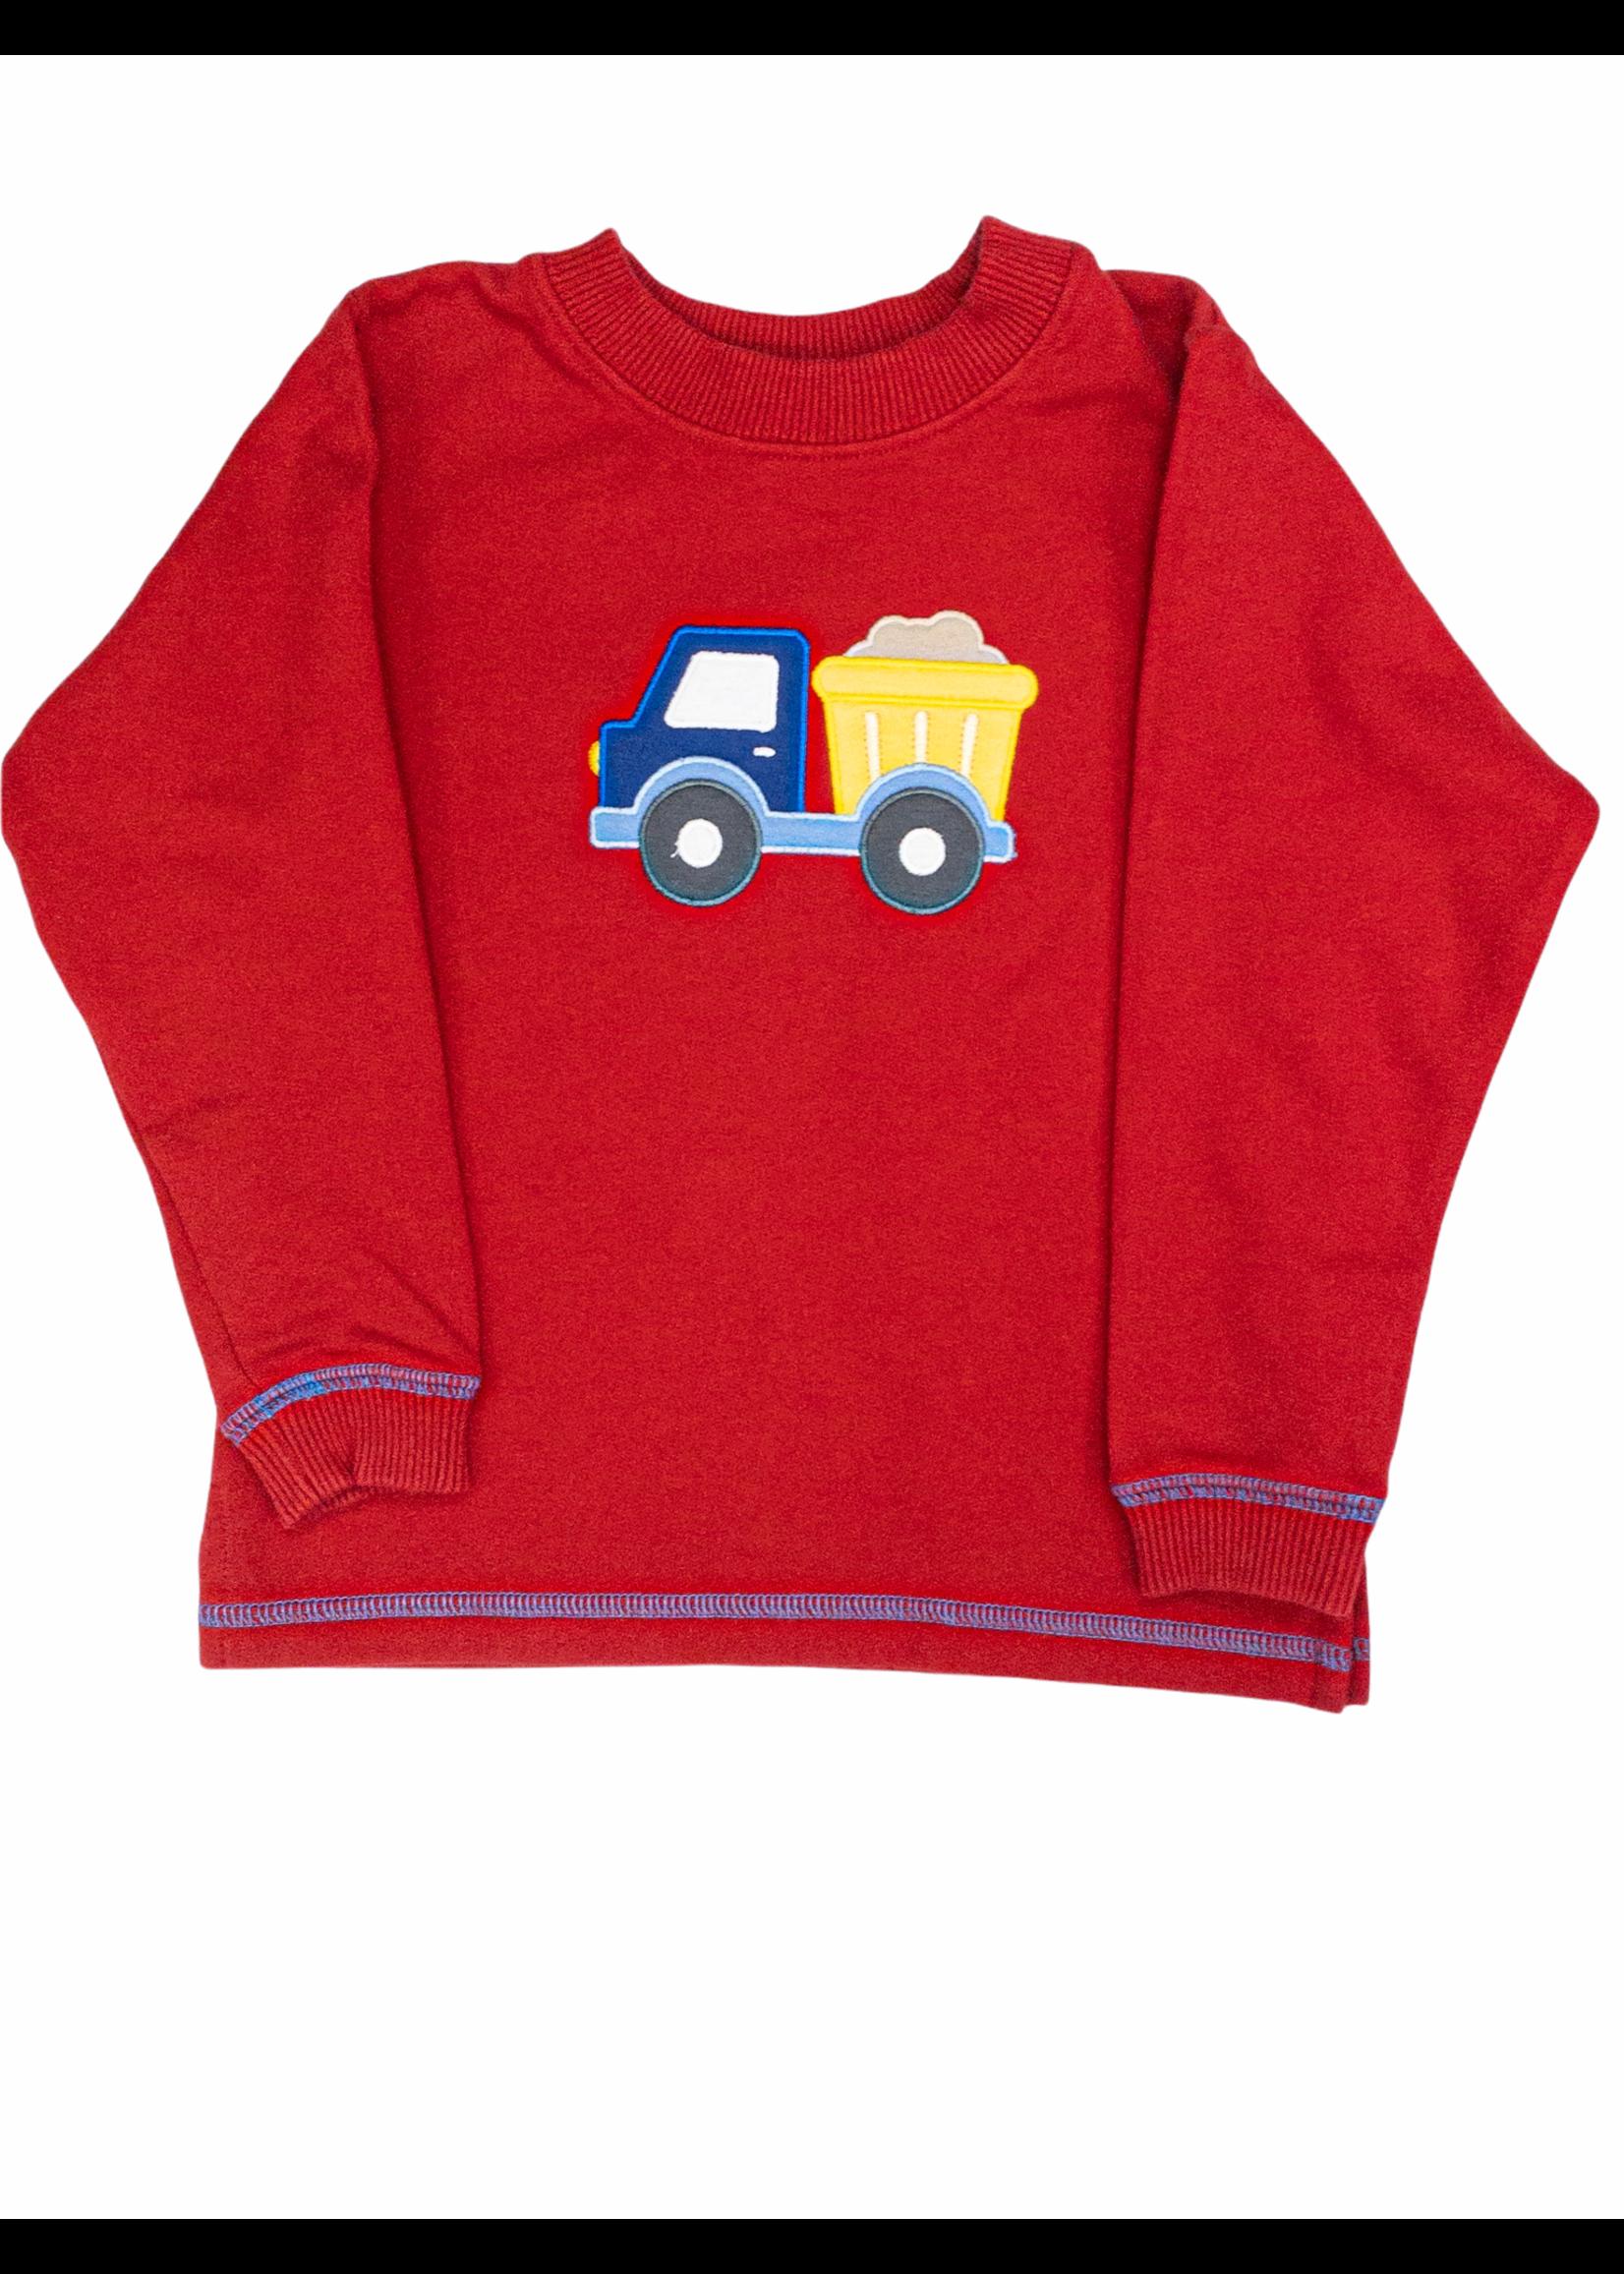 Luigi Dump Truck Sweatshirt